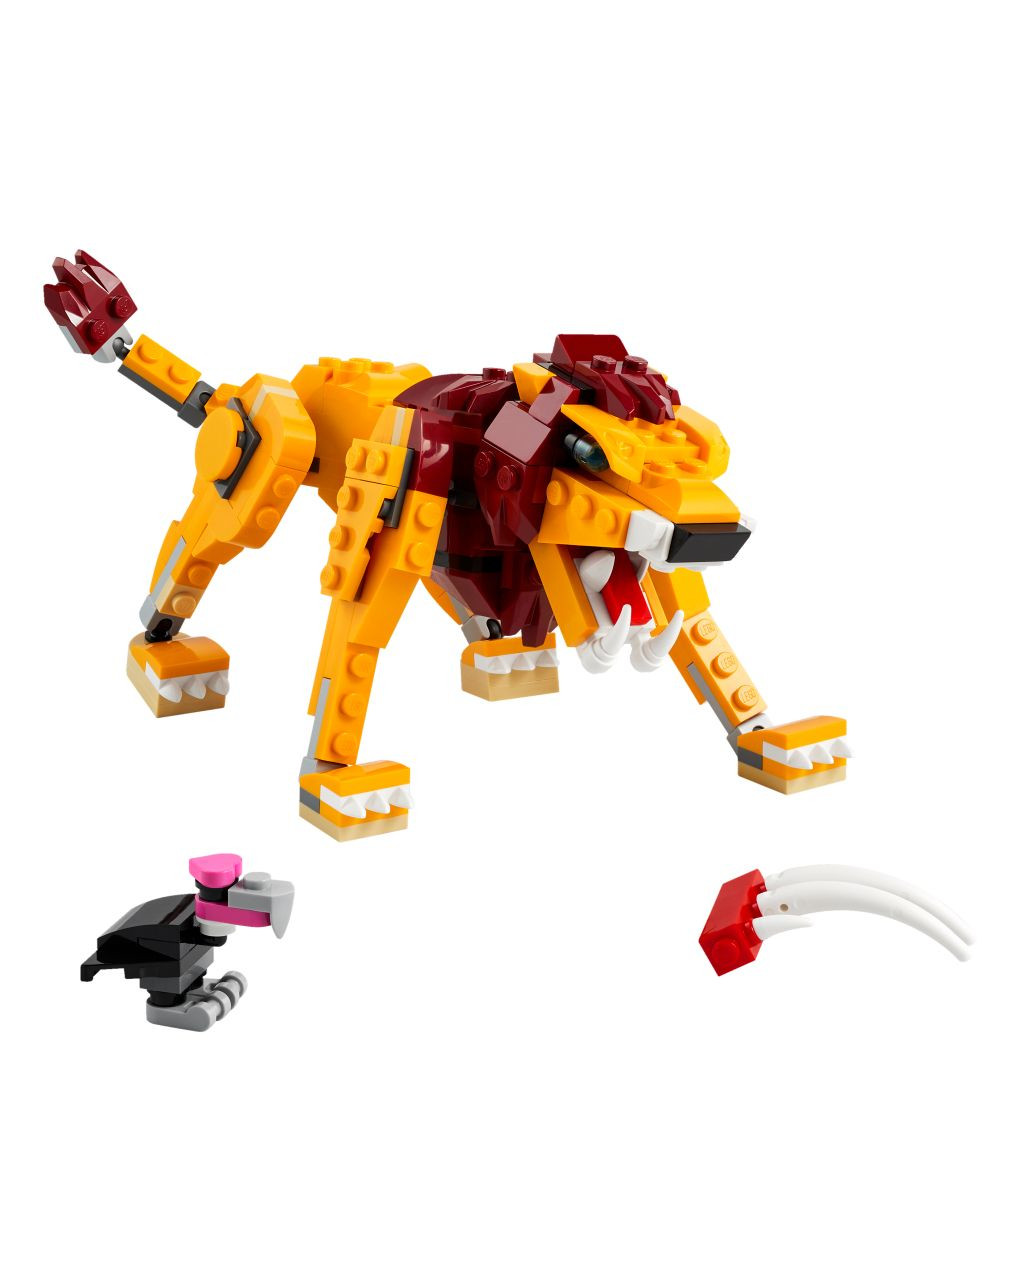 Lego creator - leone selvatico - 31112 - LEGO